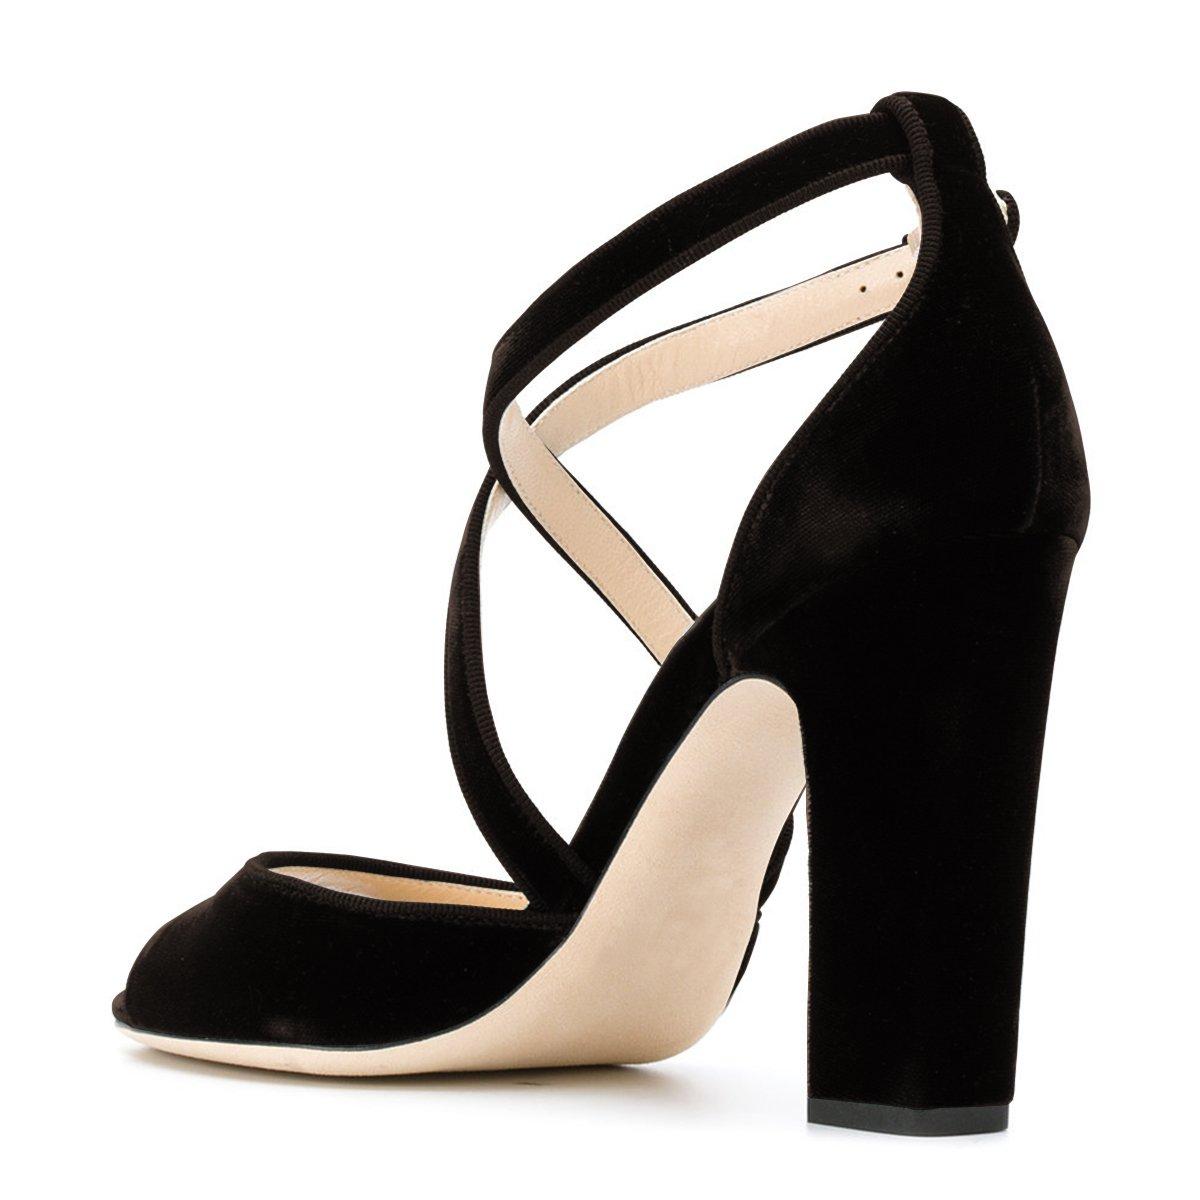 c02881a1ed3c FSJ Women Elegant Peep Toe Sandals Chunky High Heel Pumps Cross Strap  Velvet Dress Shoes Size 4-15 US